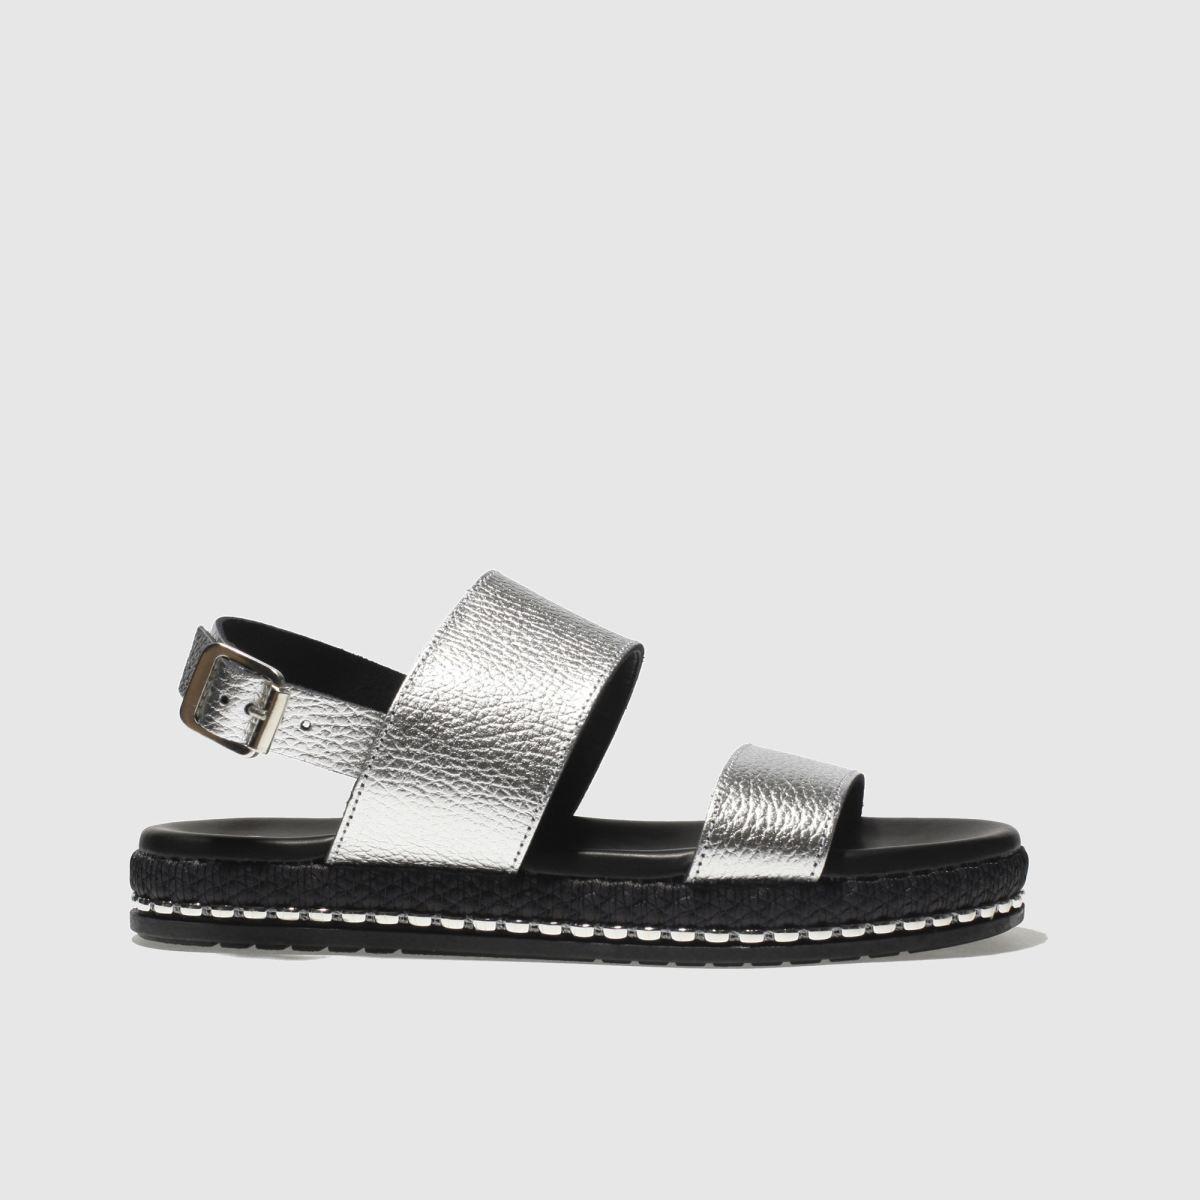 schuh Schuh Silver Melbourne Sandals